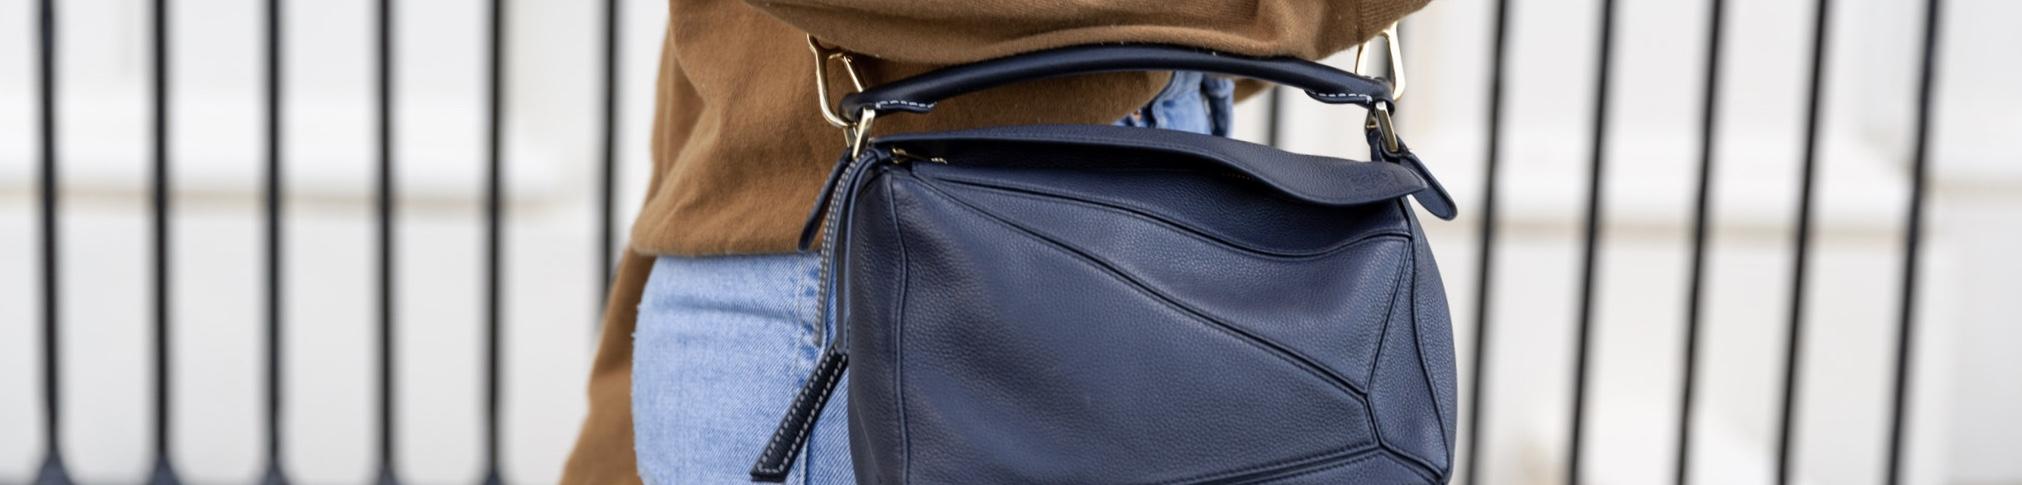 A close up photo of Anna's Loewe Bag.